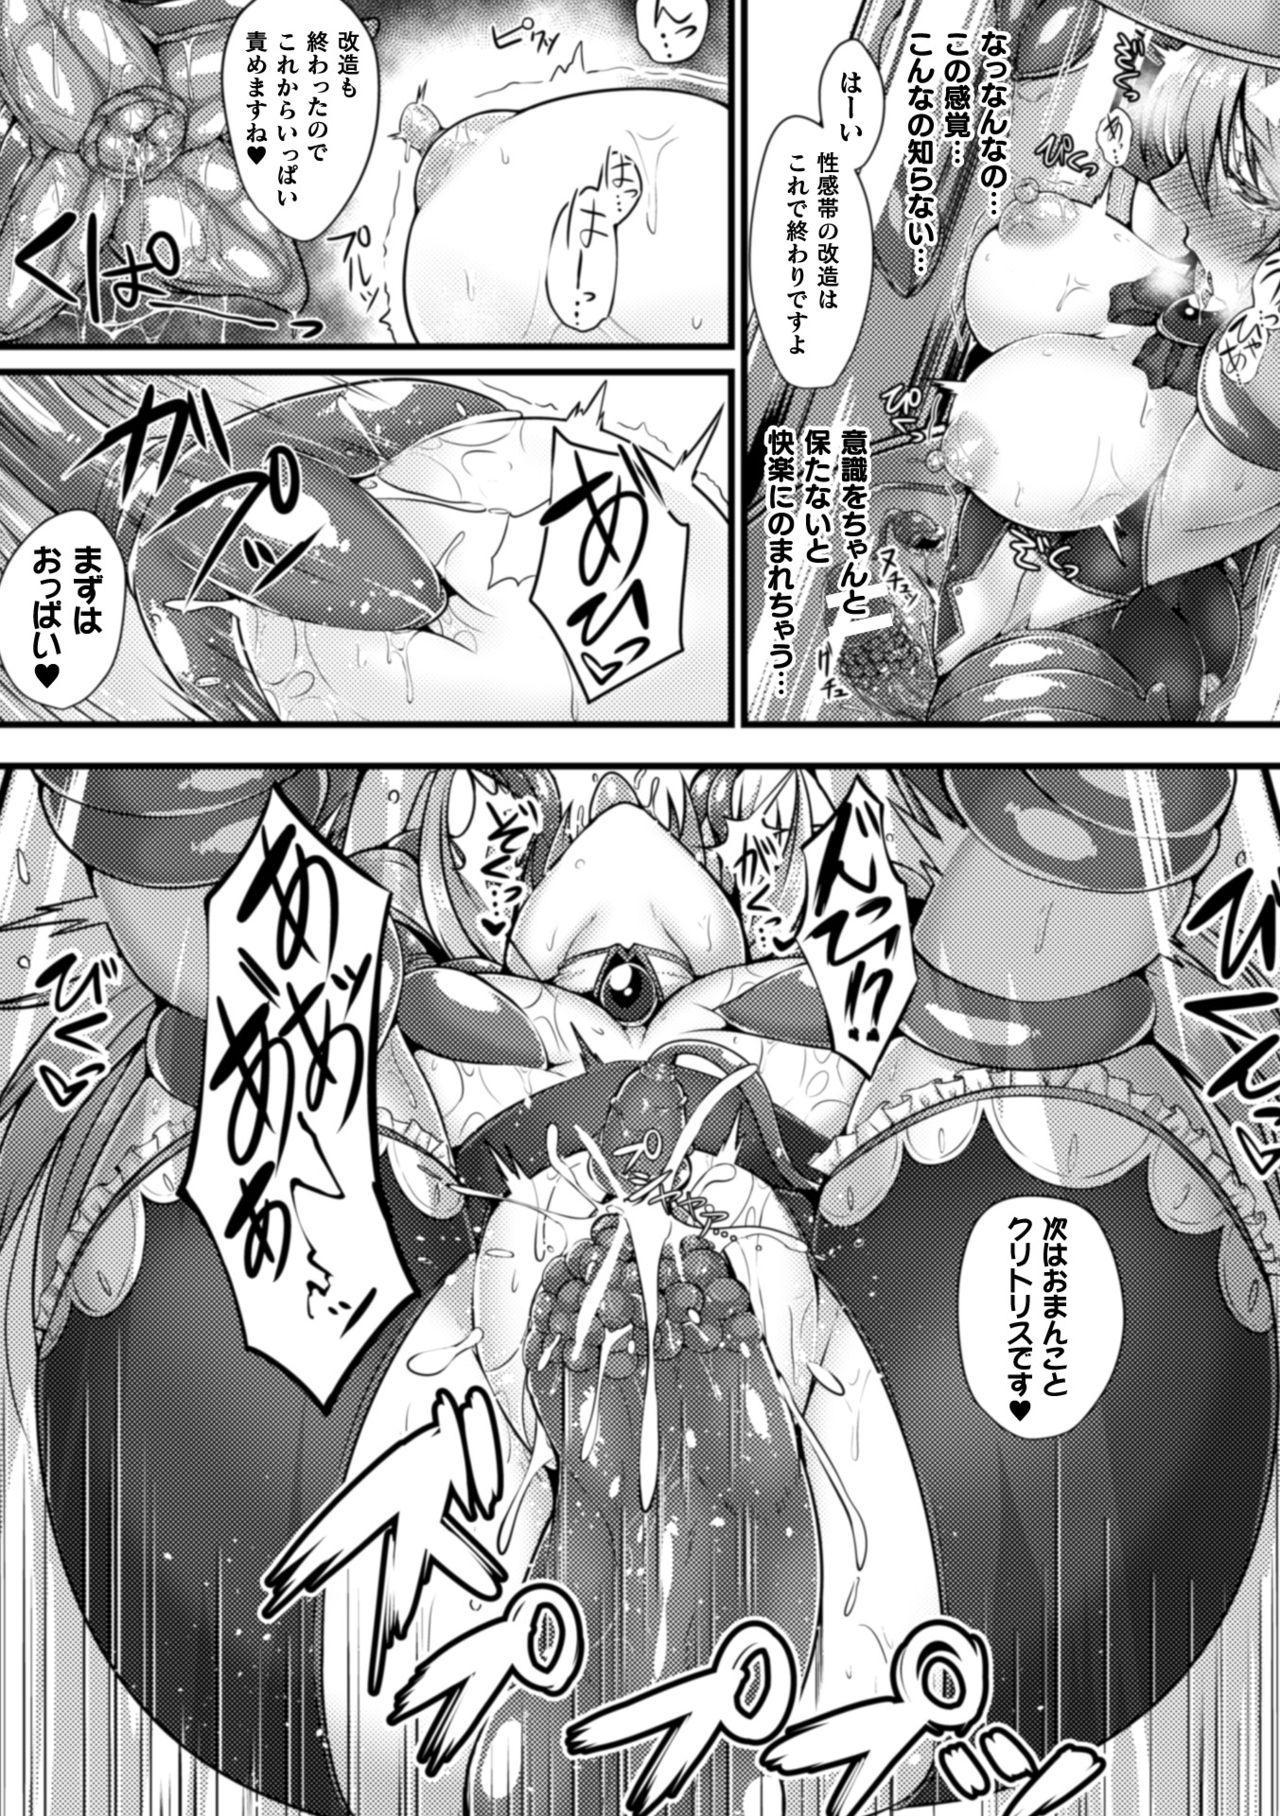 2D Comic Magazine Capsule Kan Seigi no Heroine Mesu Ochi Jikken! Vol. 2 80